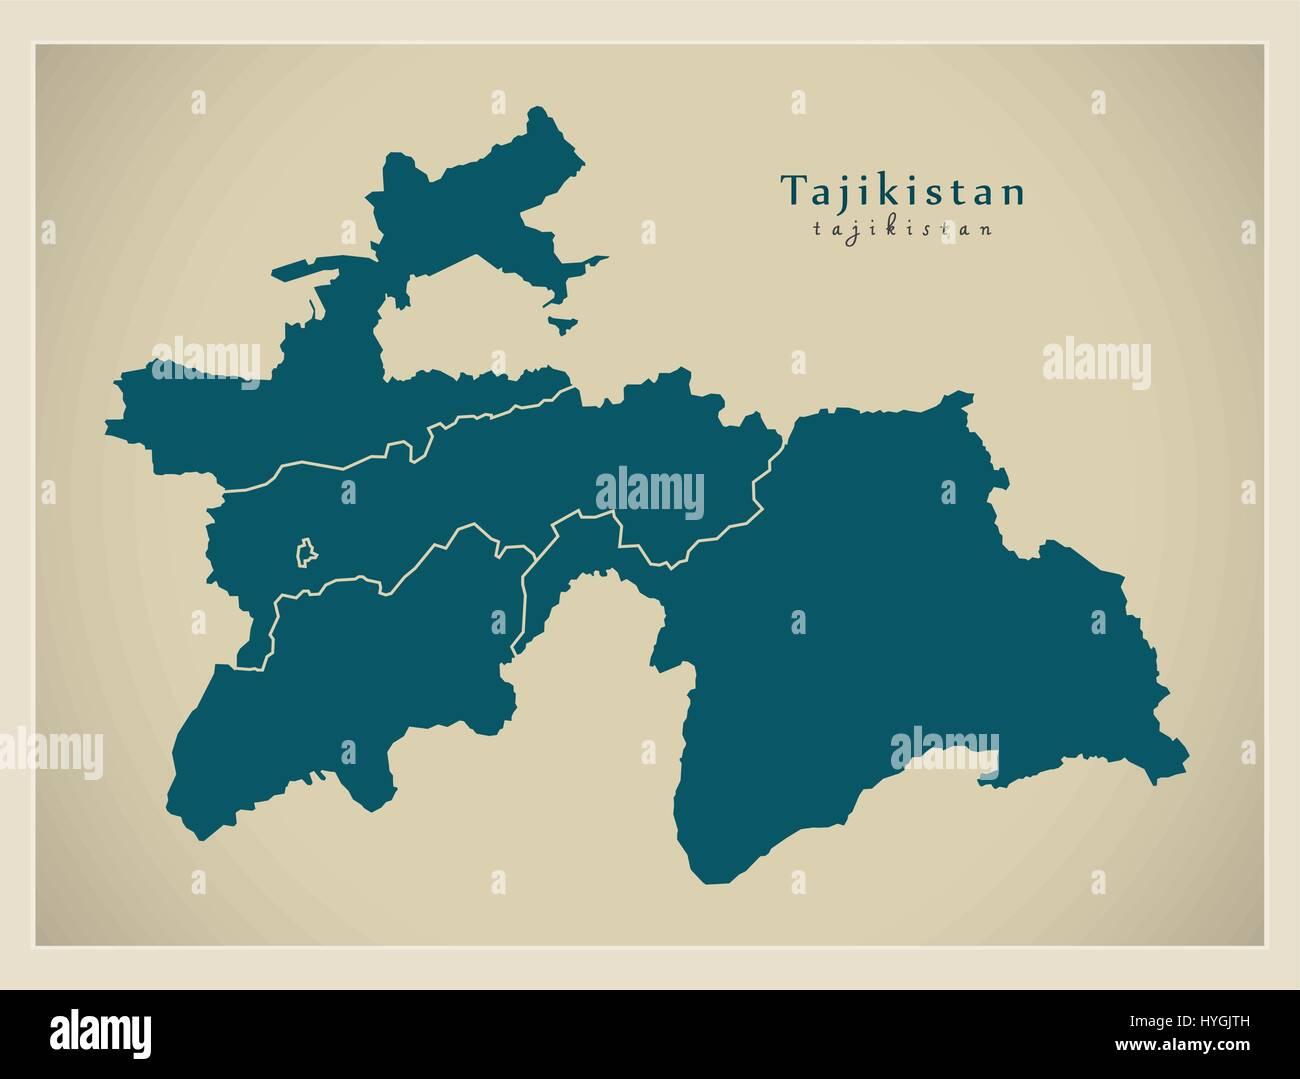 Modern Map - Tajikistan with provinces TJ - Stock Image